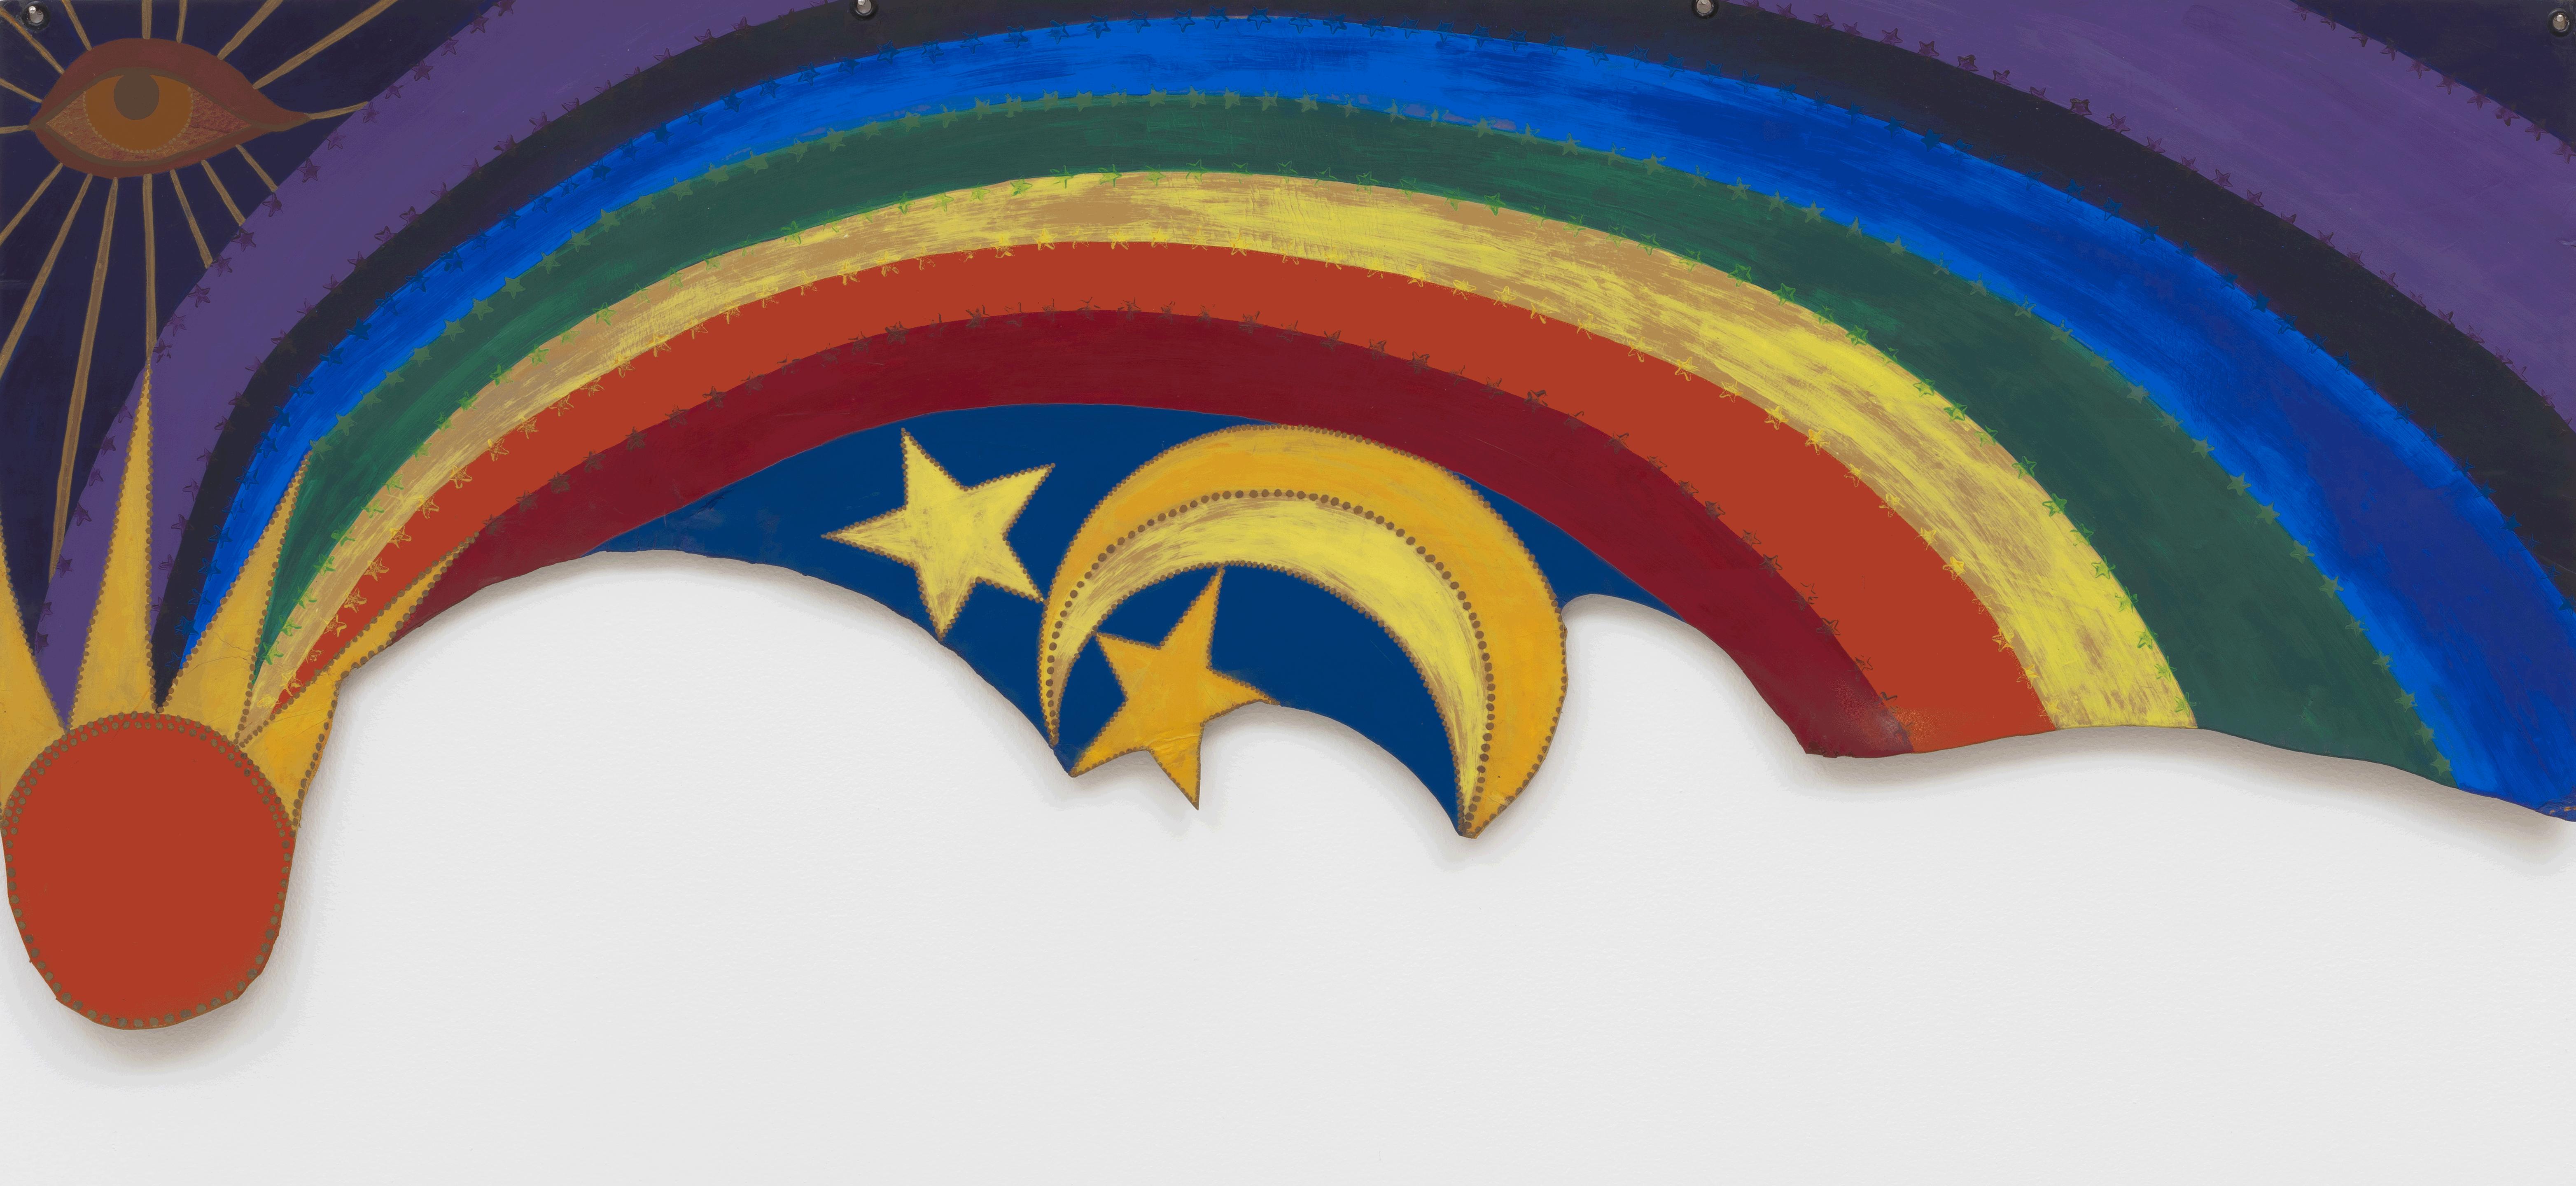 Rainbow Mojo von Betye Saar, 1972, Paul-Michael diMeglio, New York, Copyright: Betye Saar. Courtesy of the artist and Roberts & Tilton, Los Angeles, California